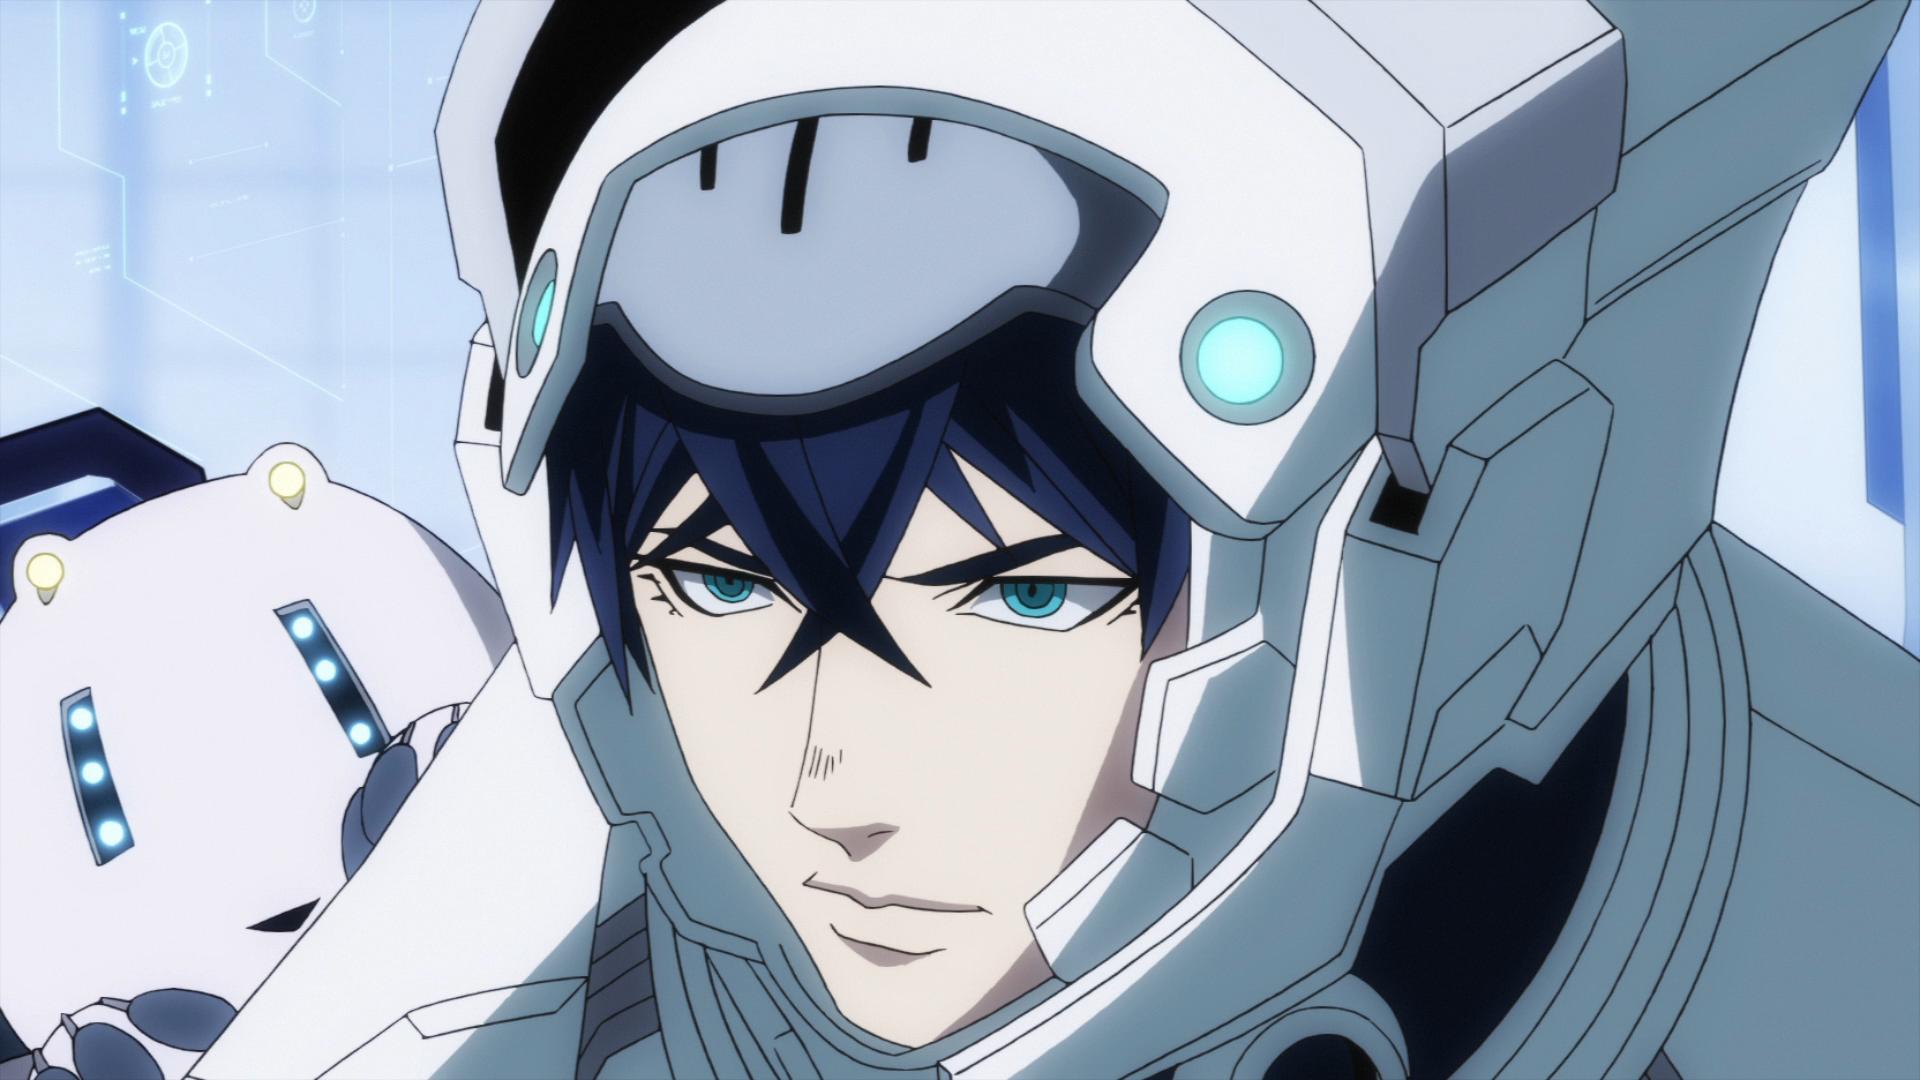 [Golumpa] Space Battleship Tiramisu S2 - 04 (Uchuu Senkan